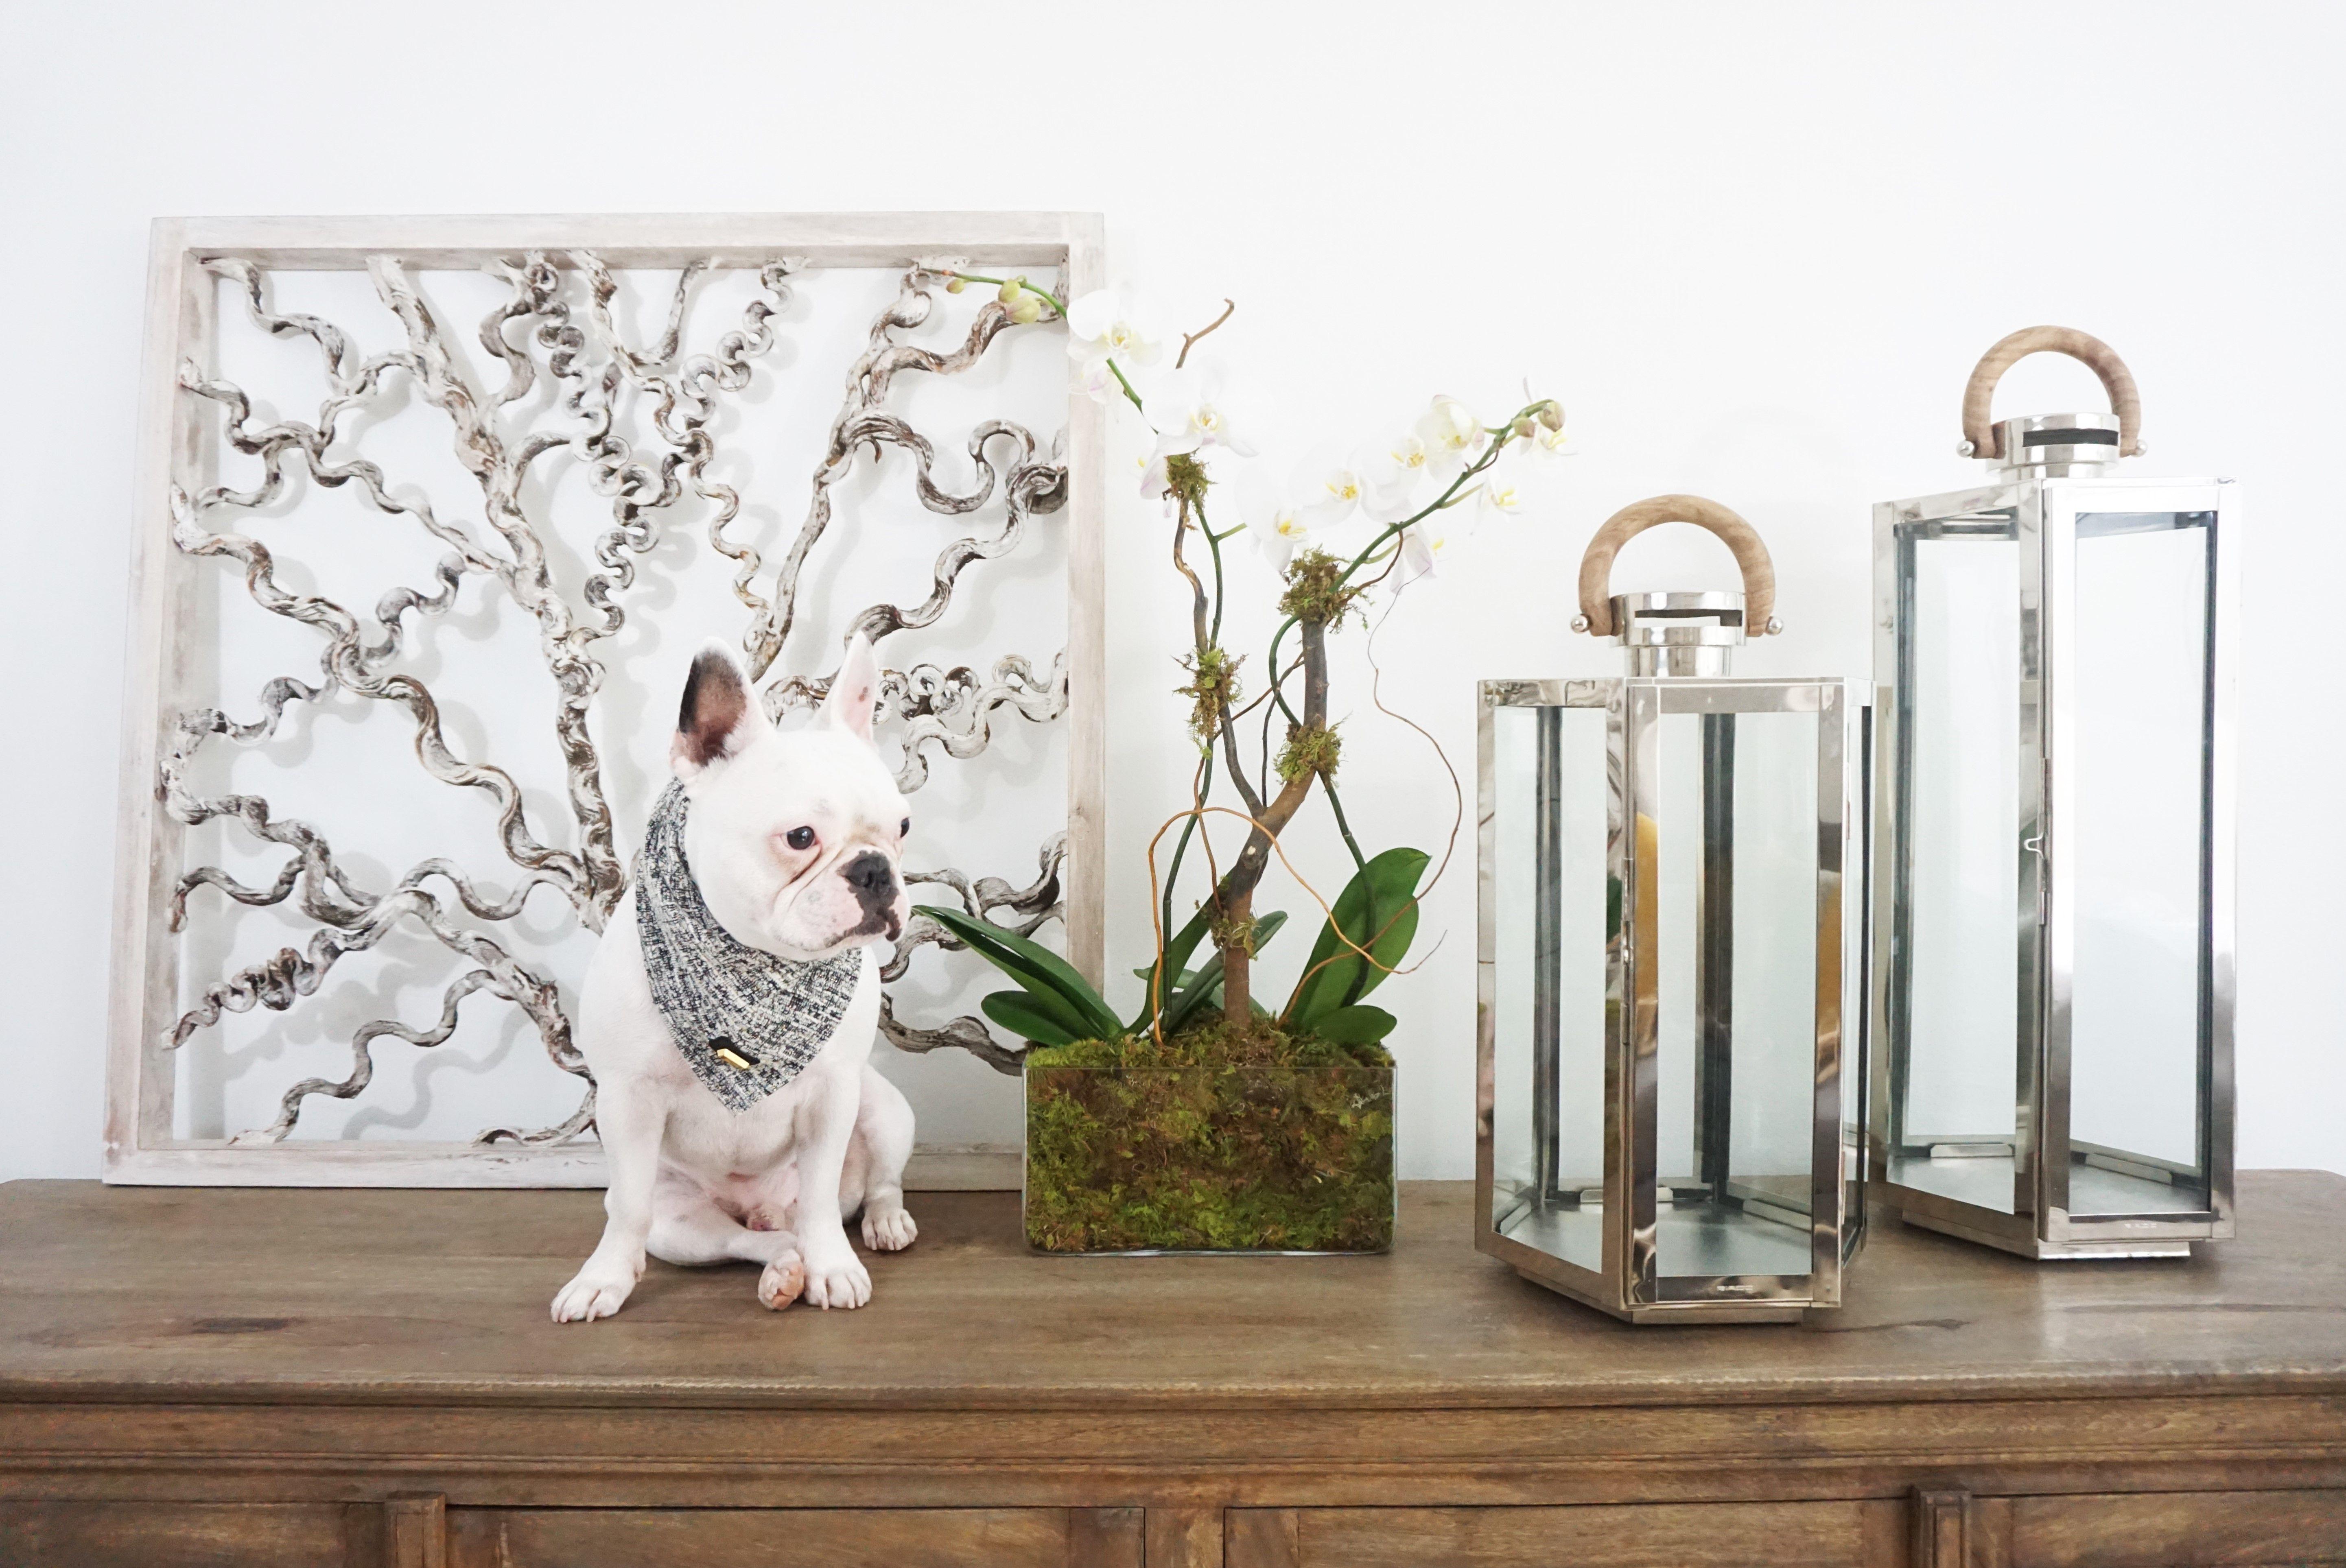 Dmaree Home - Interior Design - Home Decor - Lanterns